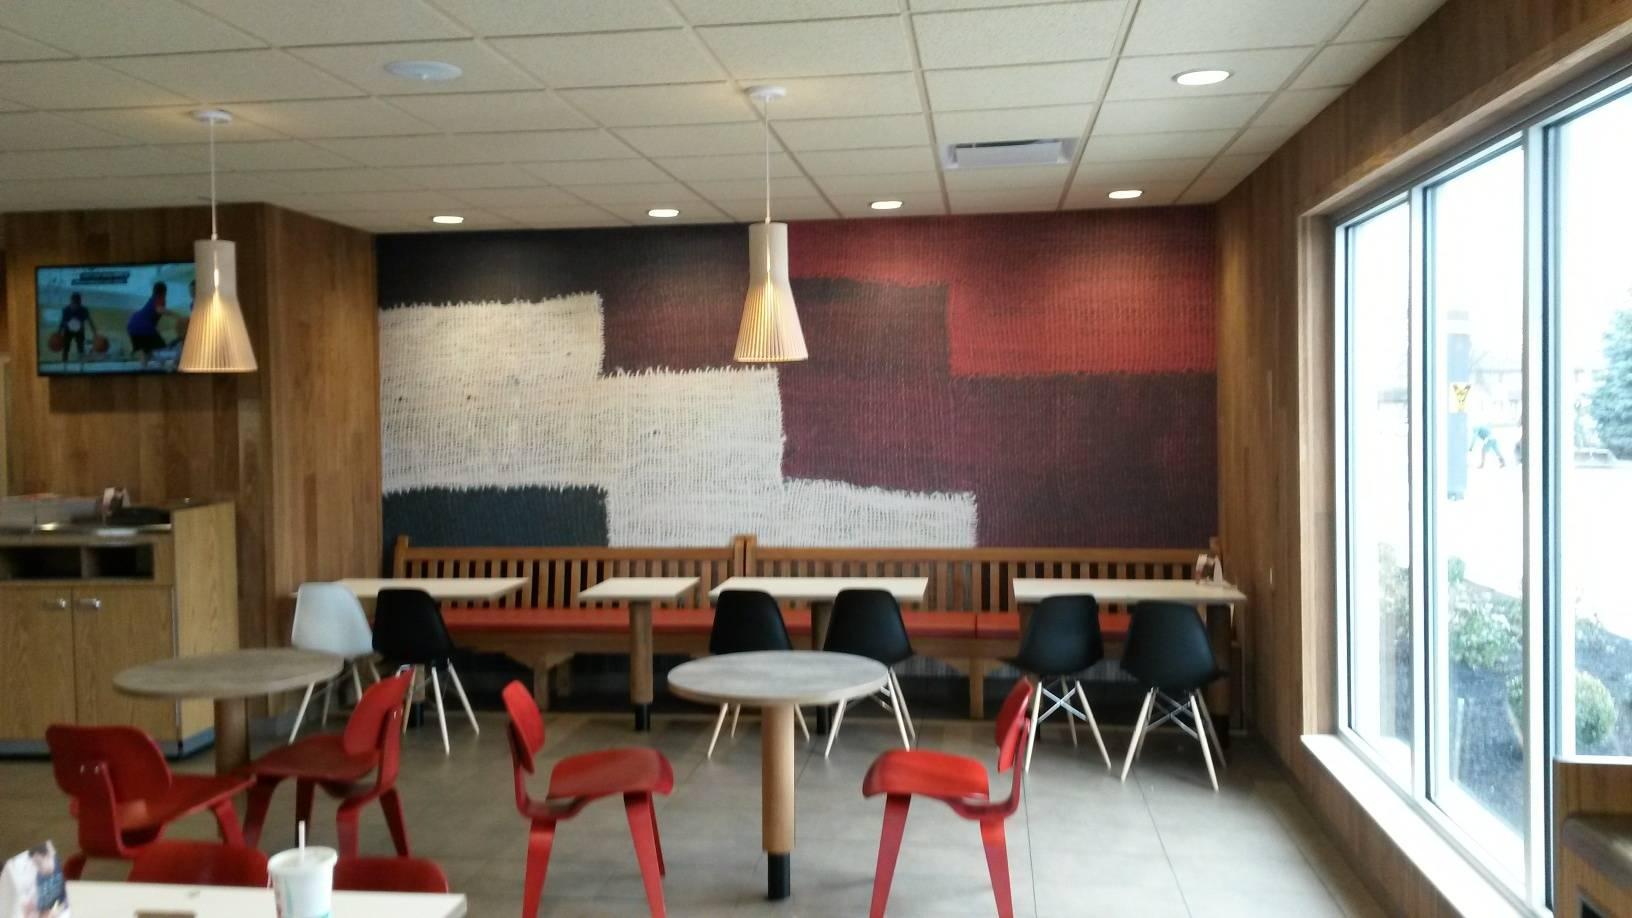 McDonald's Busyrus Ohio